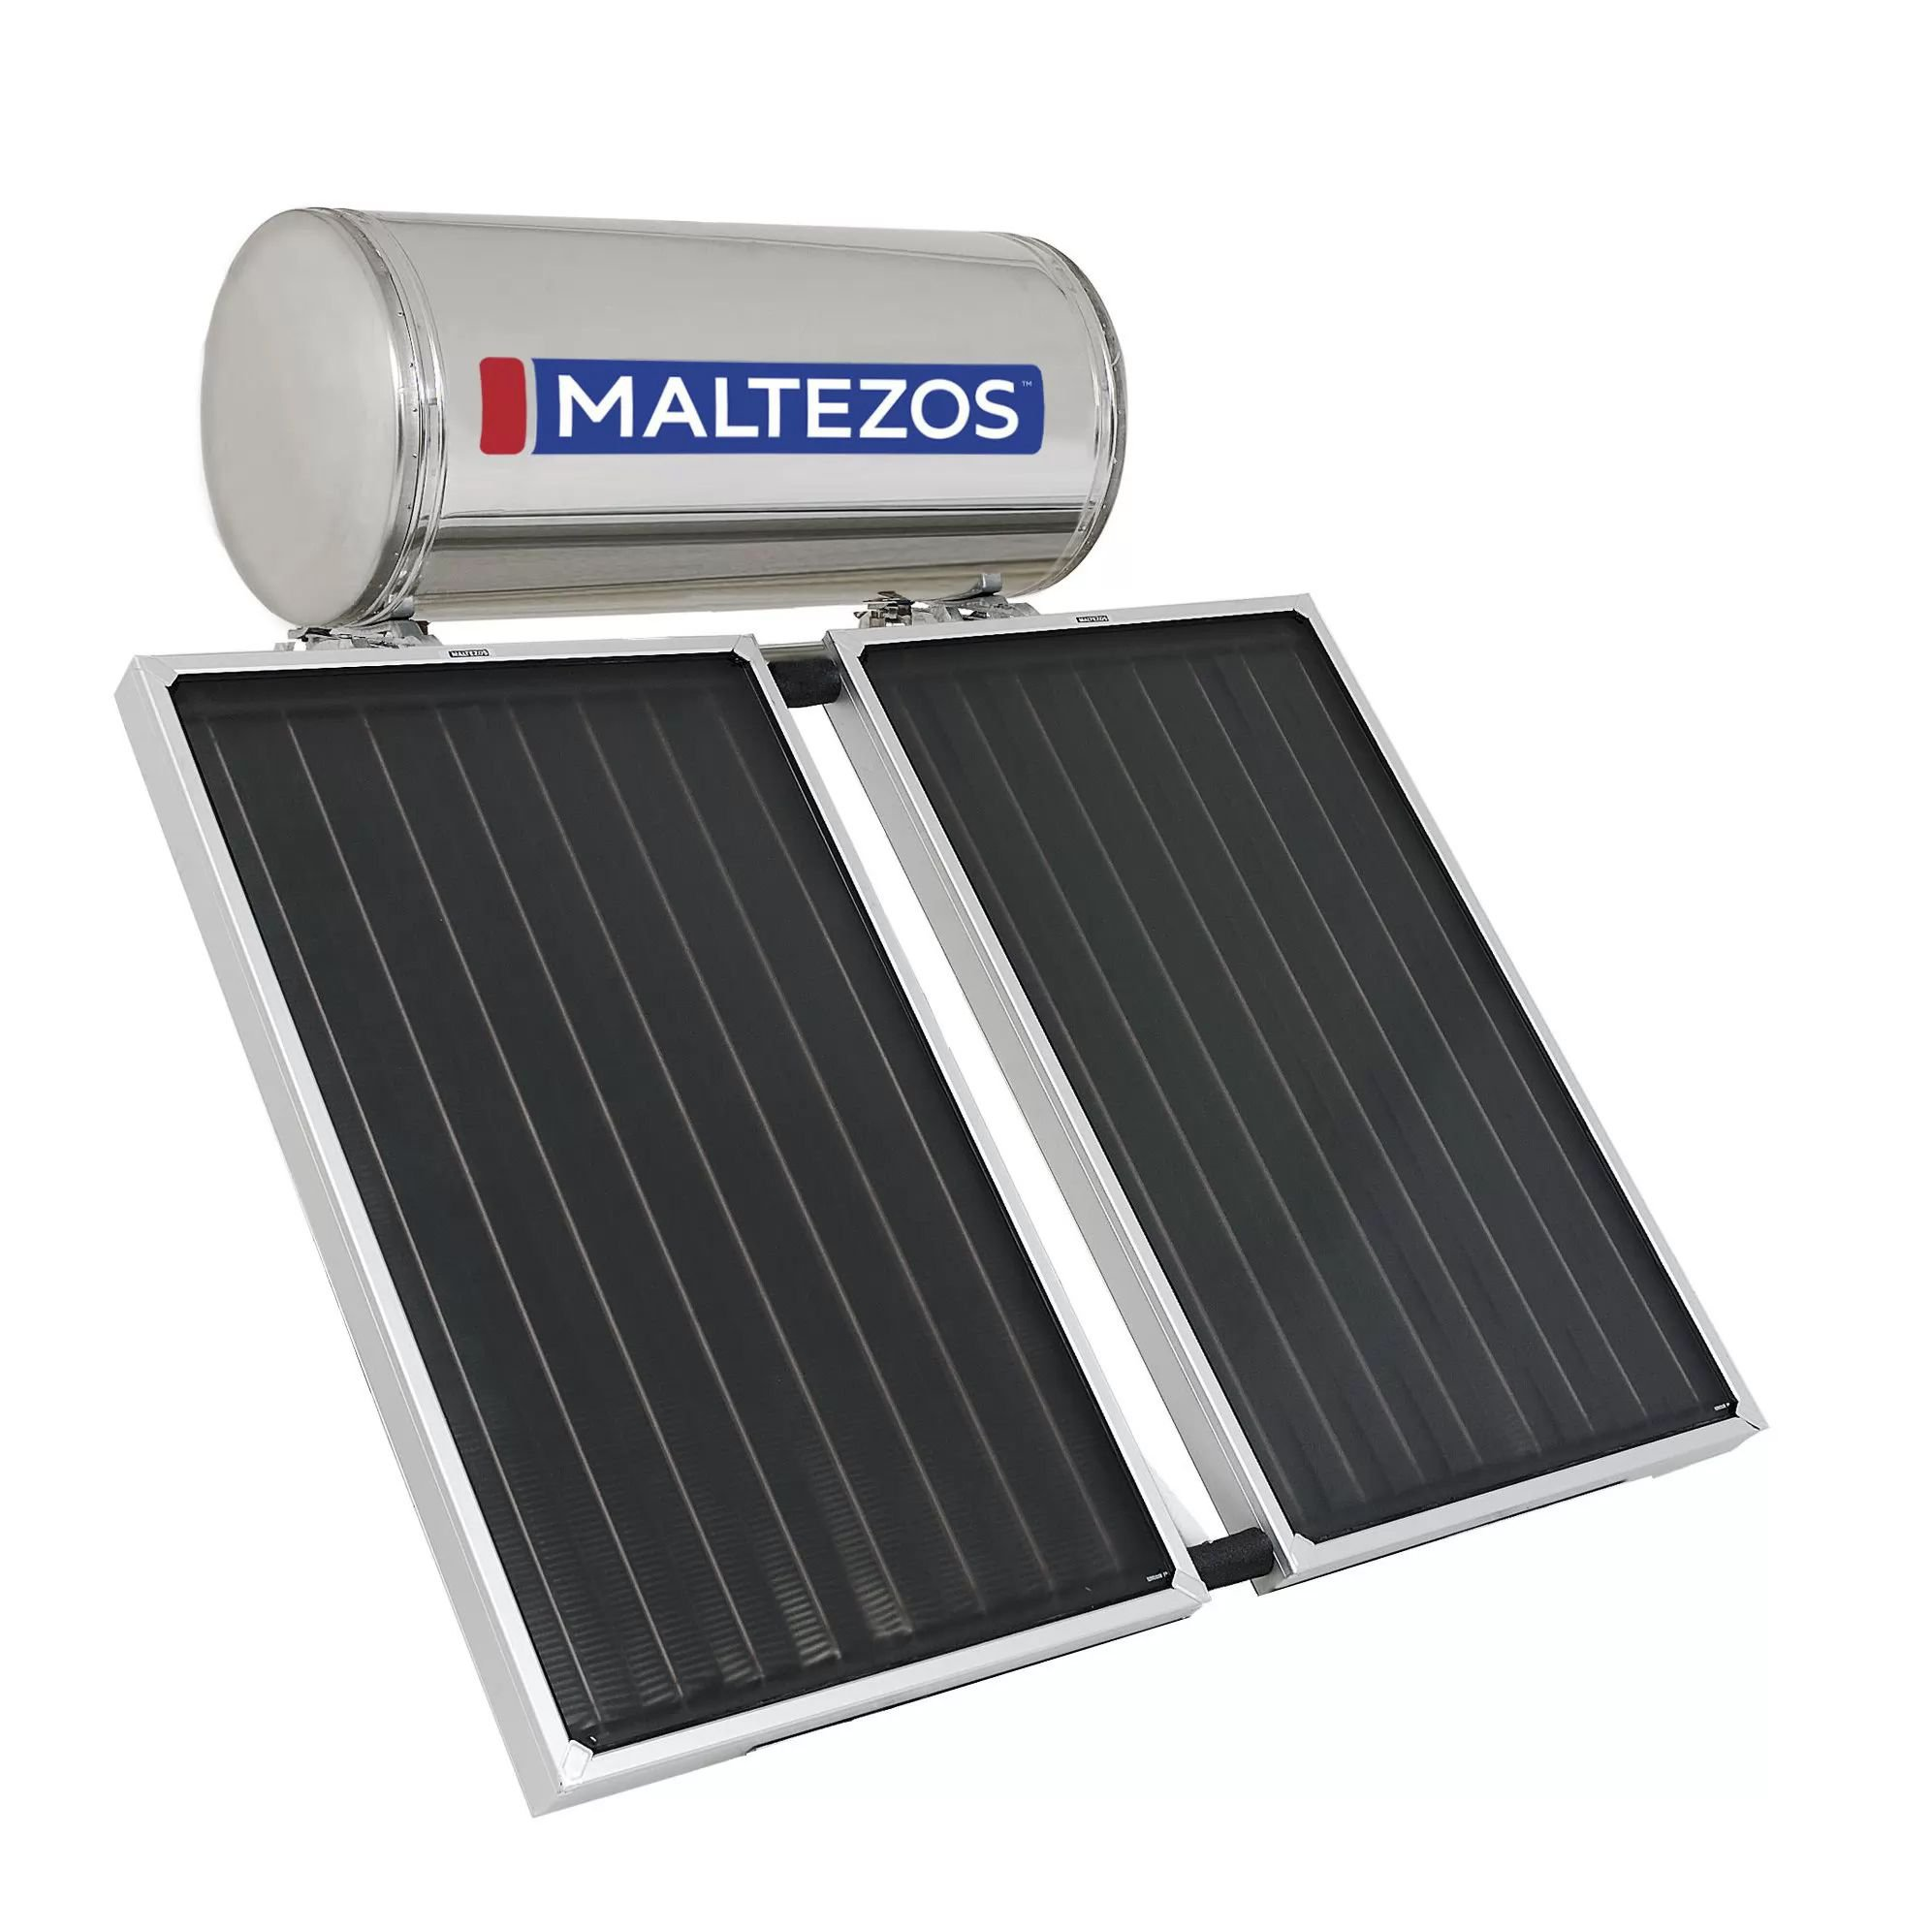 MALTEZOS MALT H 200Lt INOX ΤΡΙΠΛΗΣ ΕΝΕΡΓΕΙΑΣ 2 ΕΠΙΛΛΕΚΤΙΚΟΙ ΣΥΛΛΕΚΤΕΣ SAC 90x150